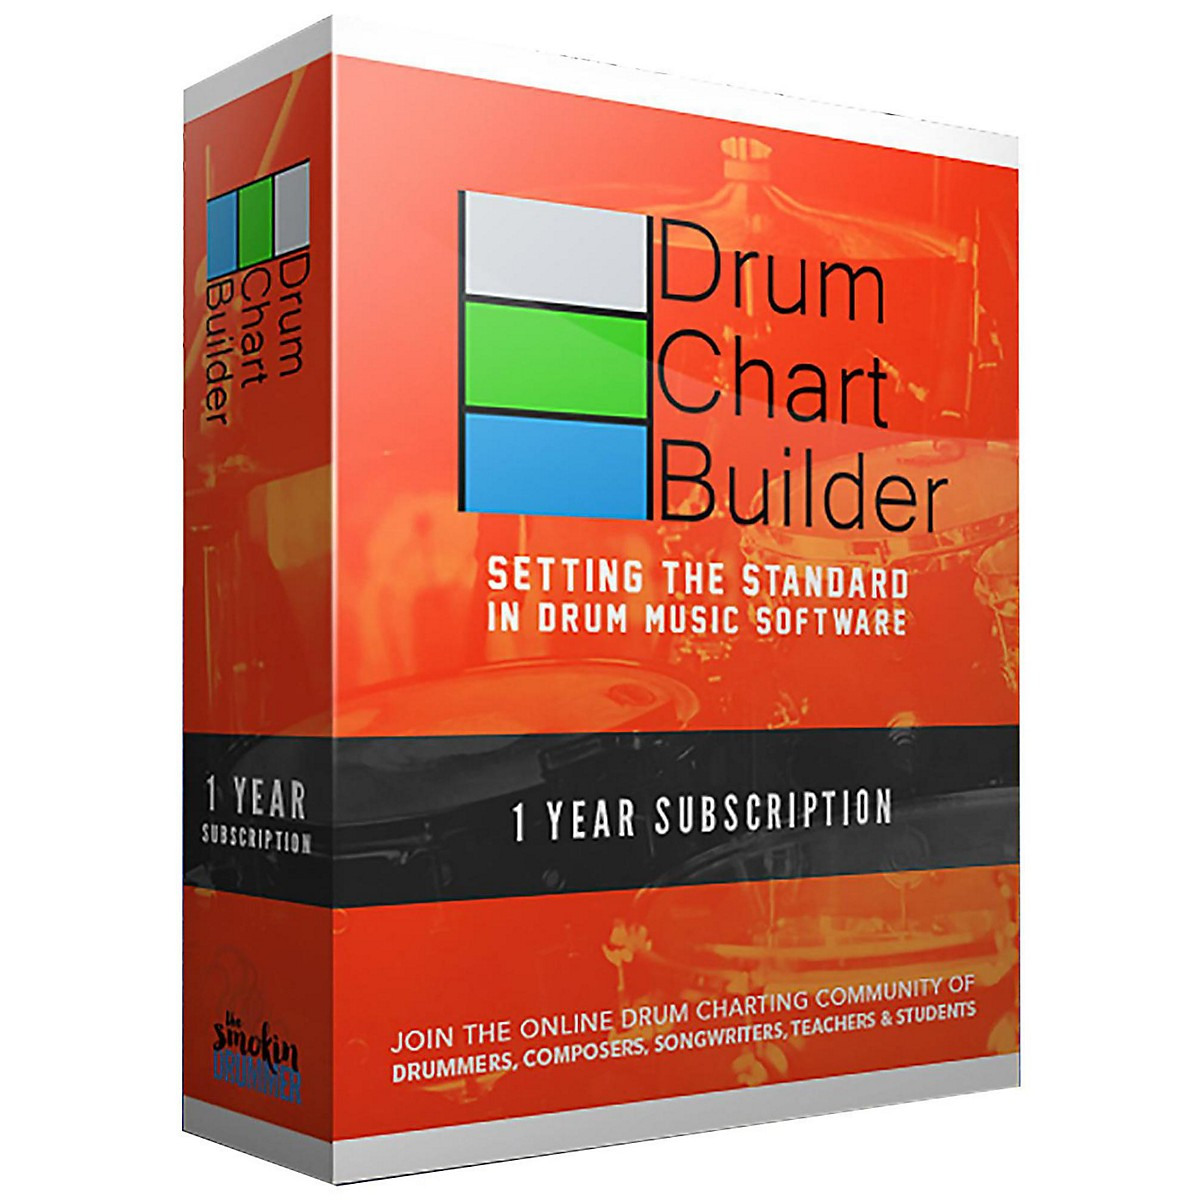 Drum Chart Builder Drum Chart Builder 1 Year Subscription